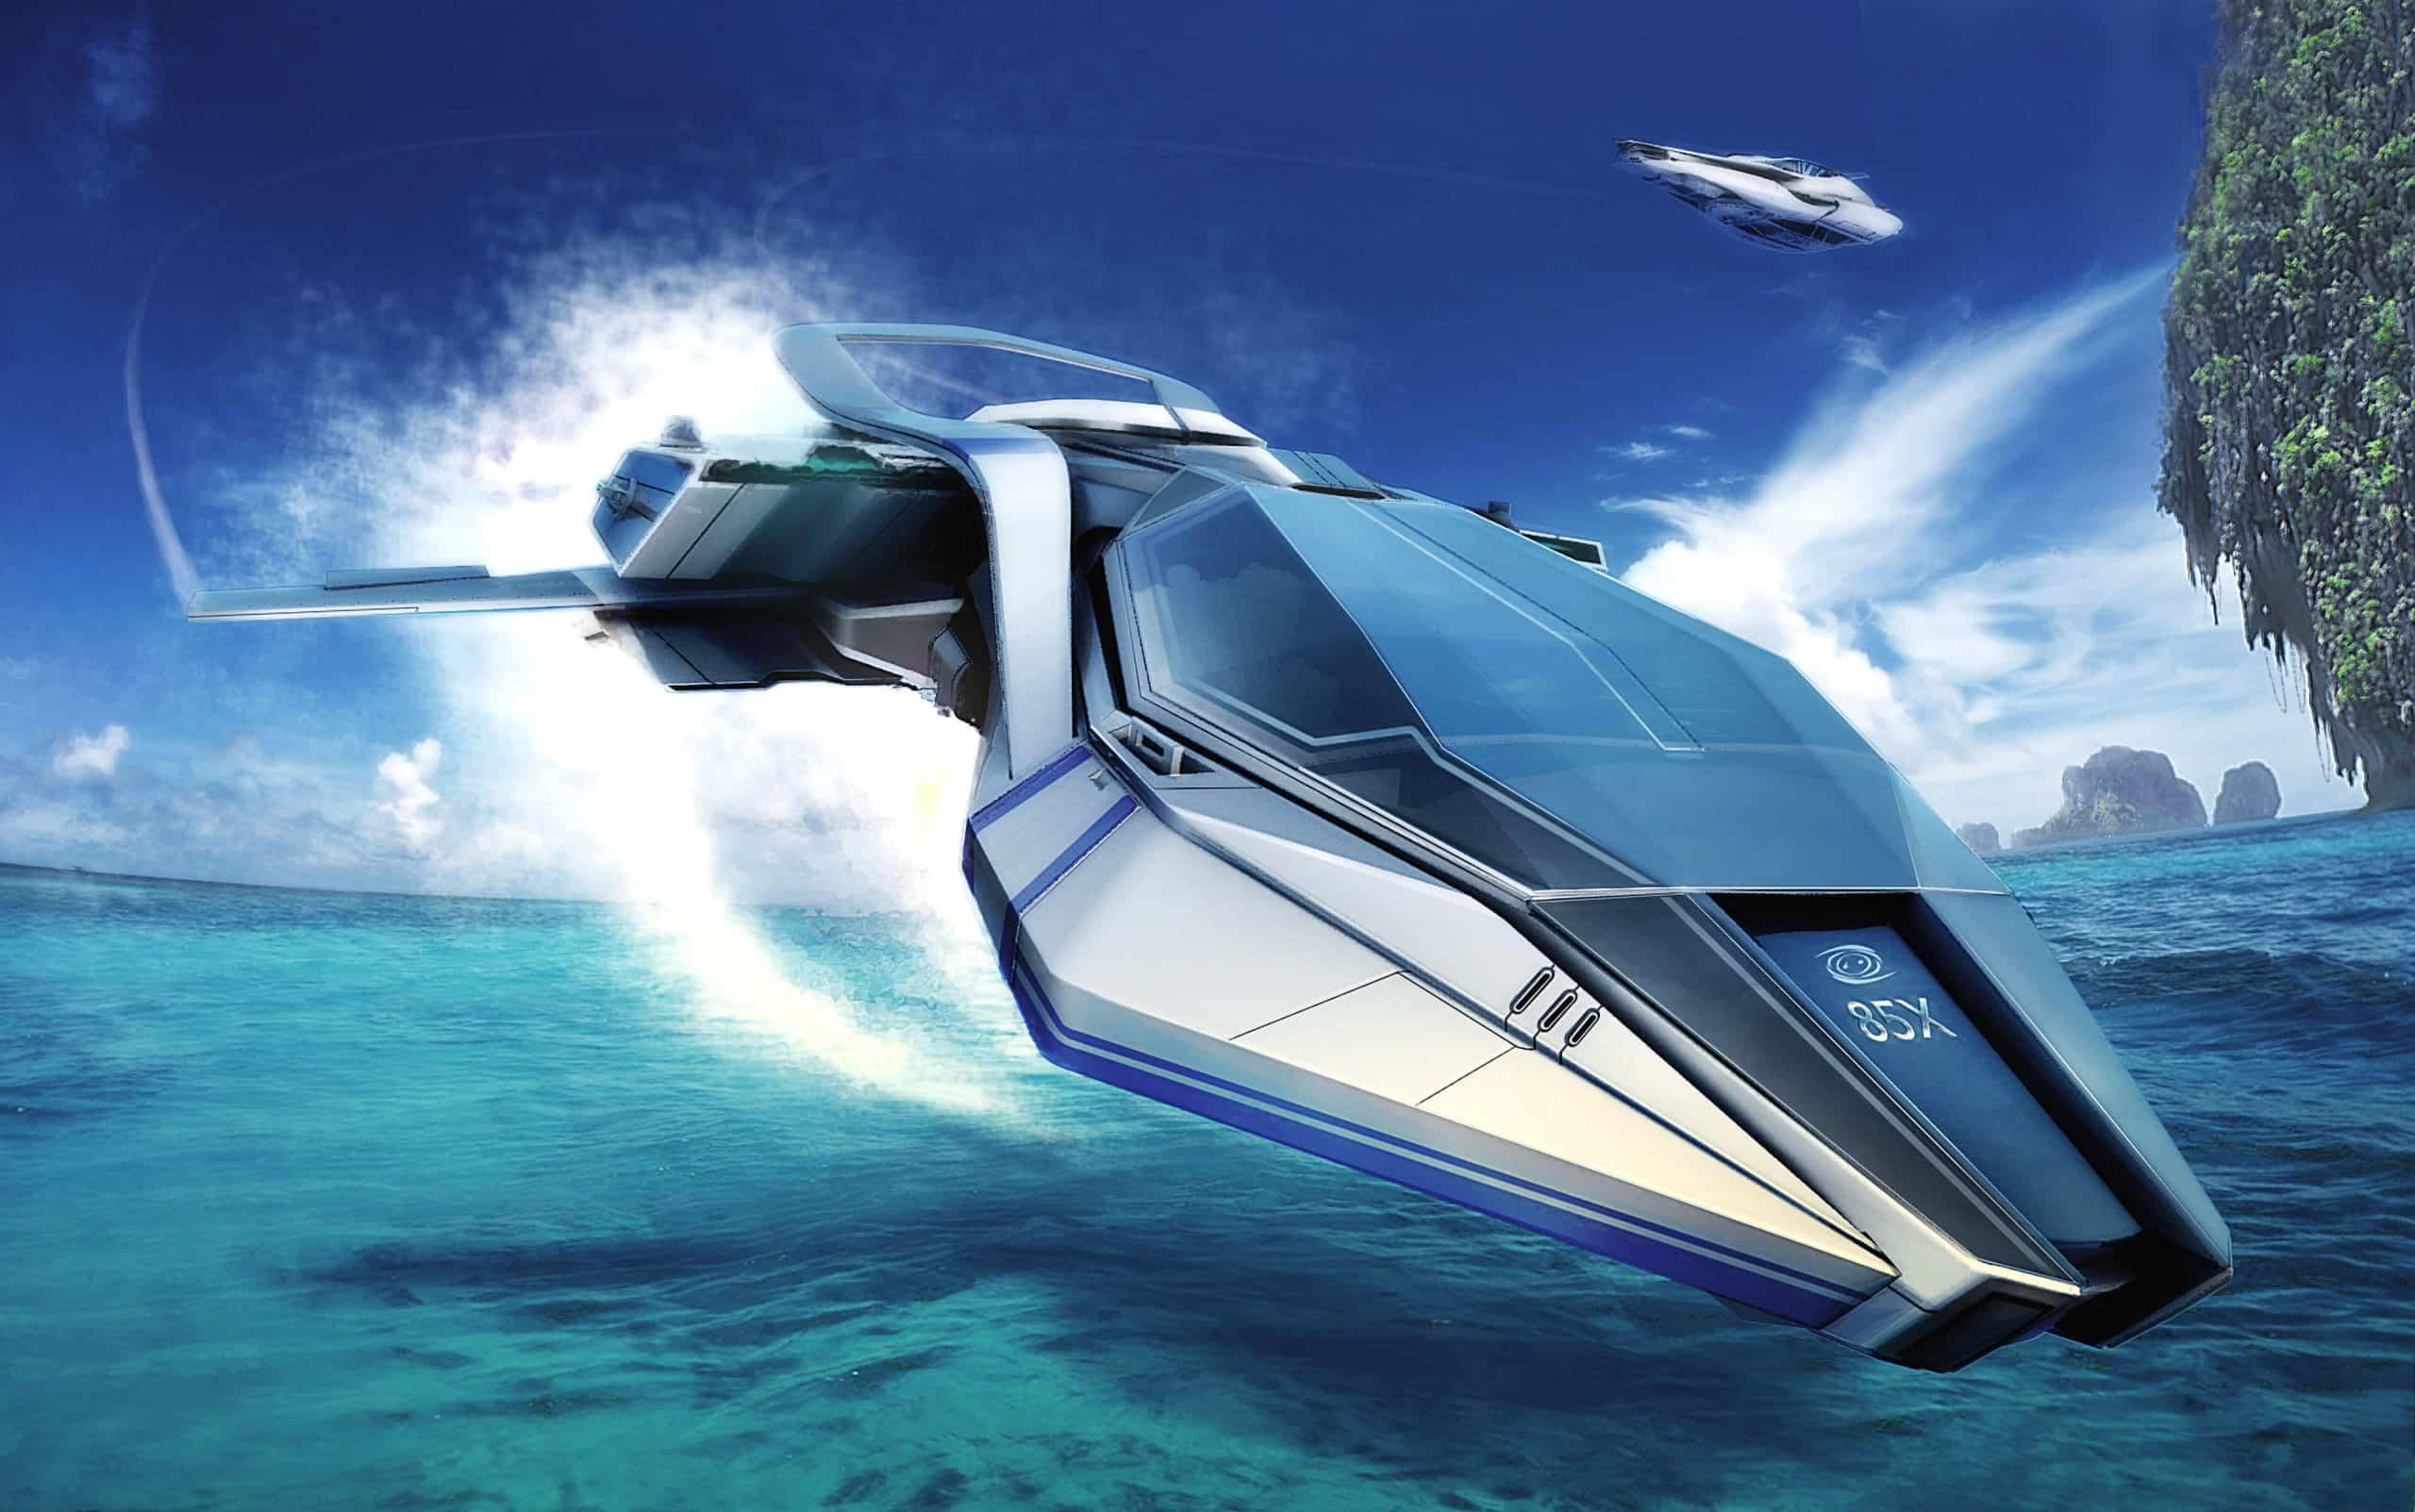 85X Star Citizen Referral Code STAR-GN2F-6JLW